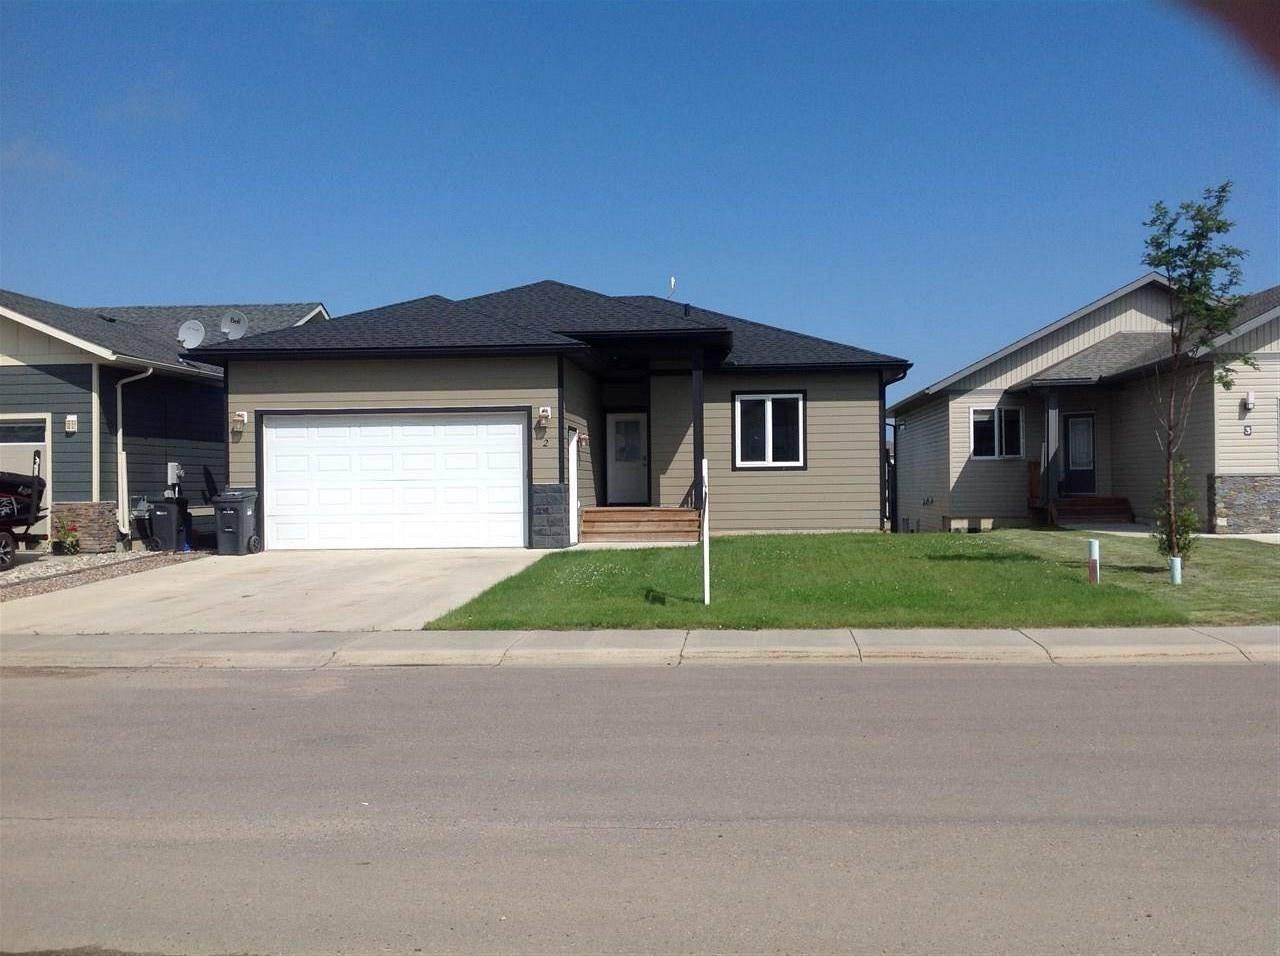 House for sale at 2 Aspen Ct Cold Lake Alberta - MLS: E4167836